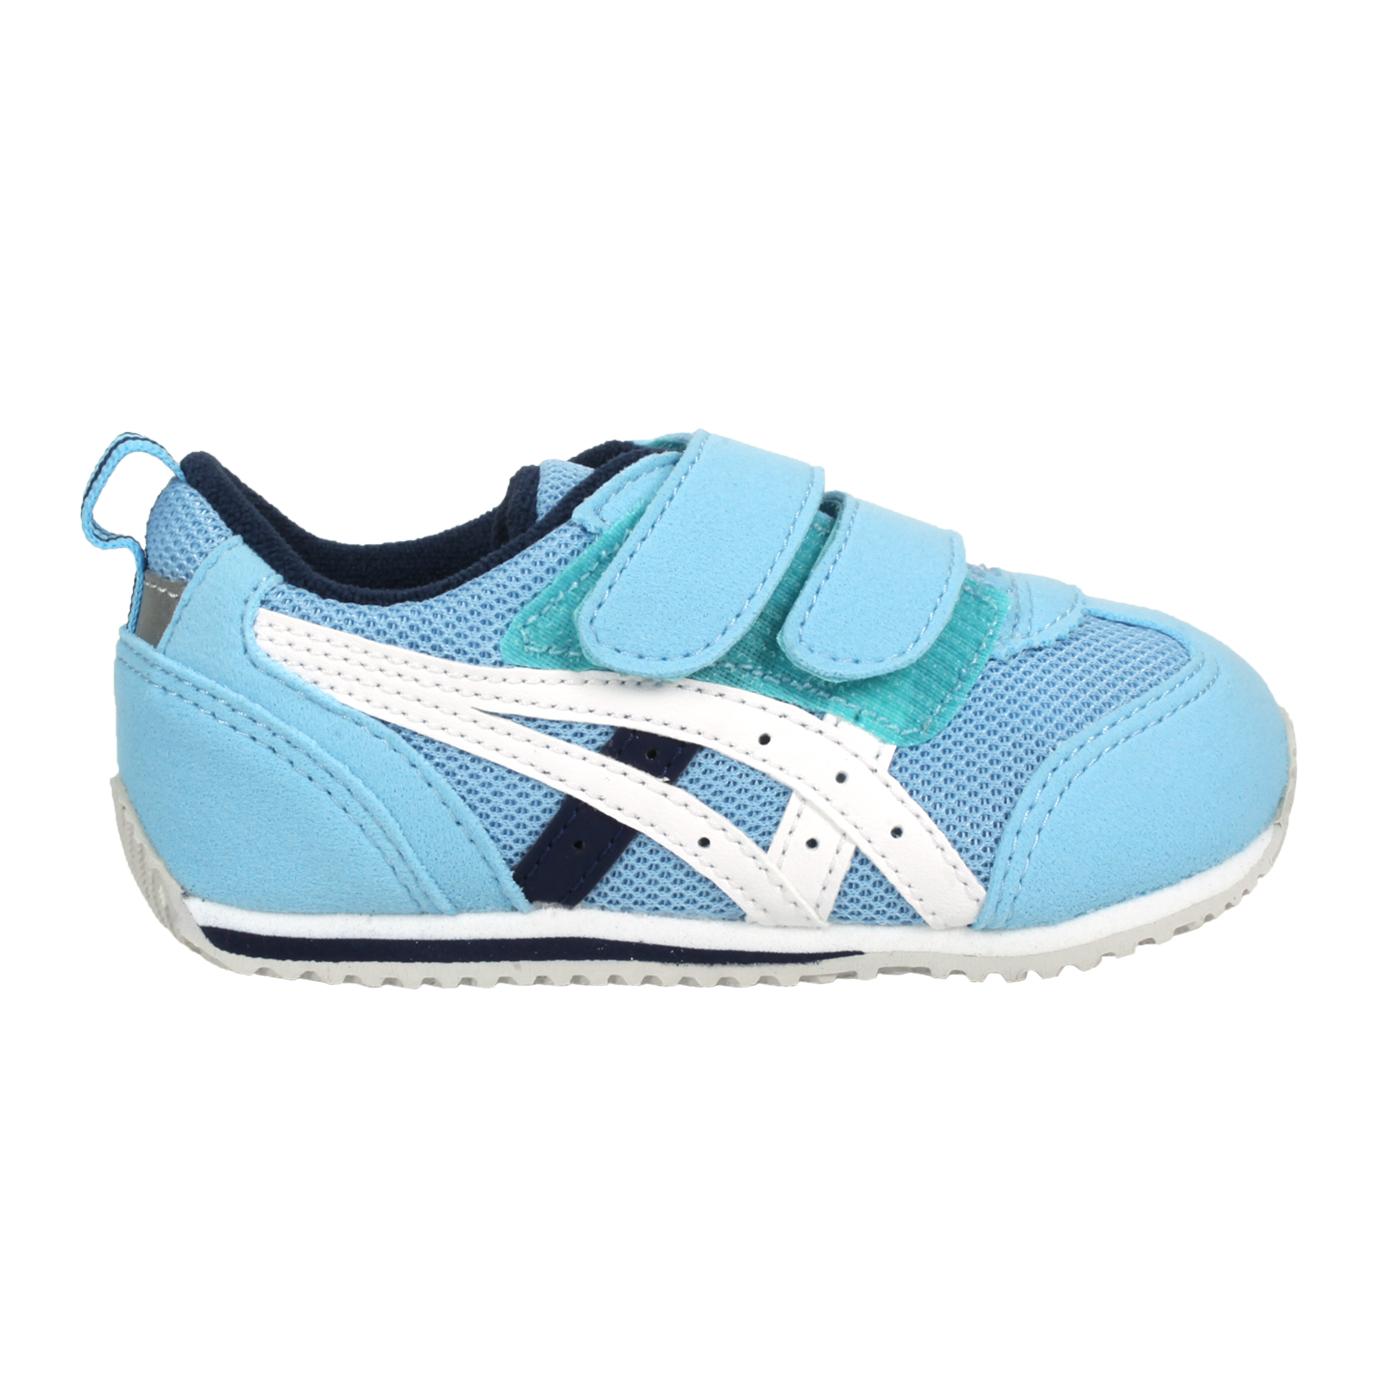 ASICS 小童運動鞋  @IDAHO BABY 3@TUB165-402